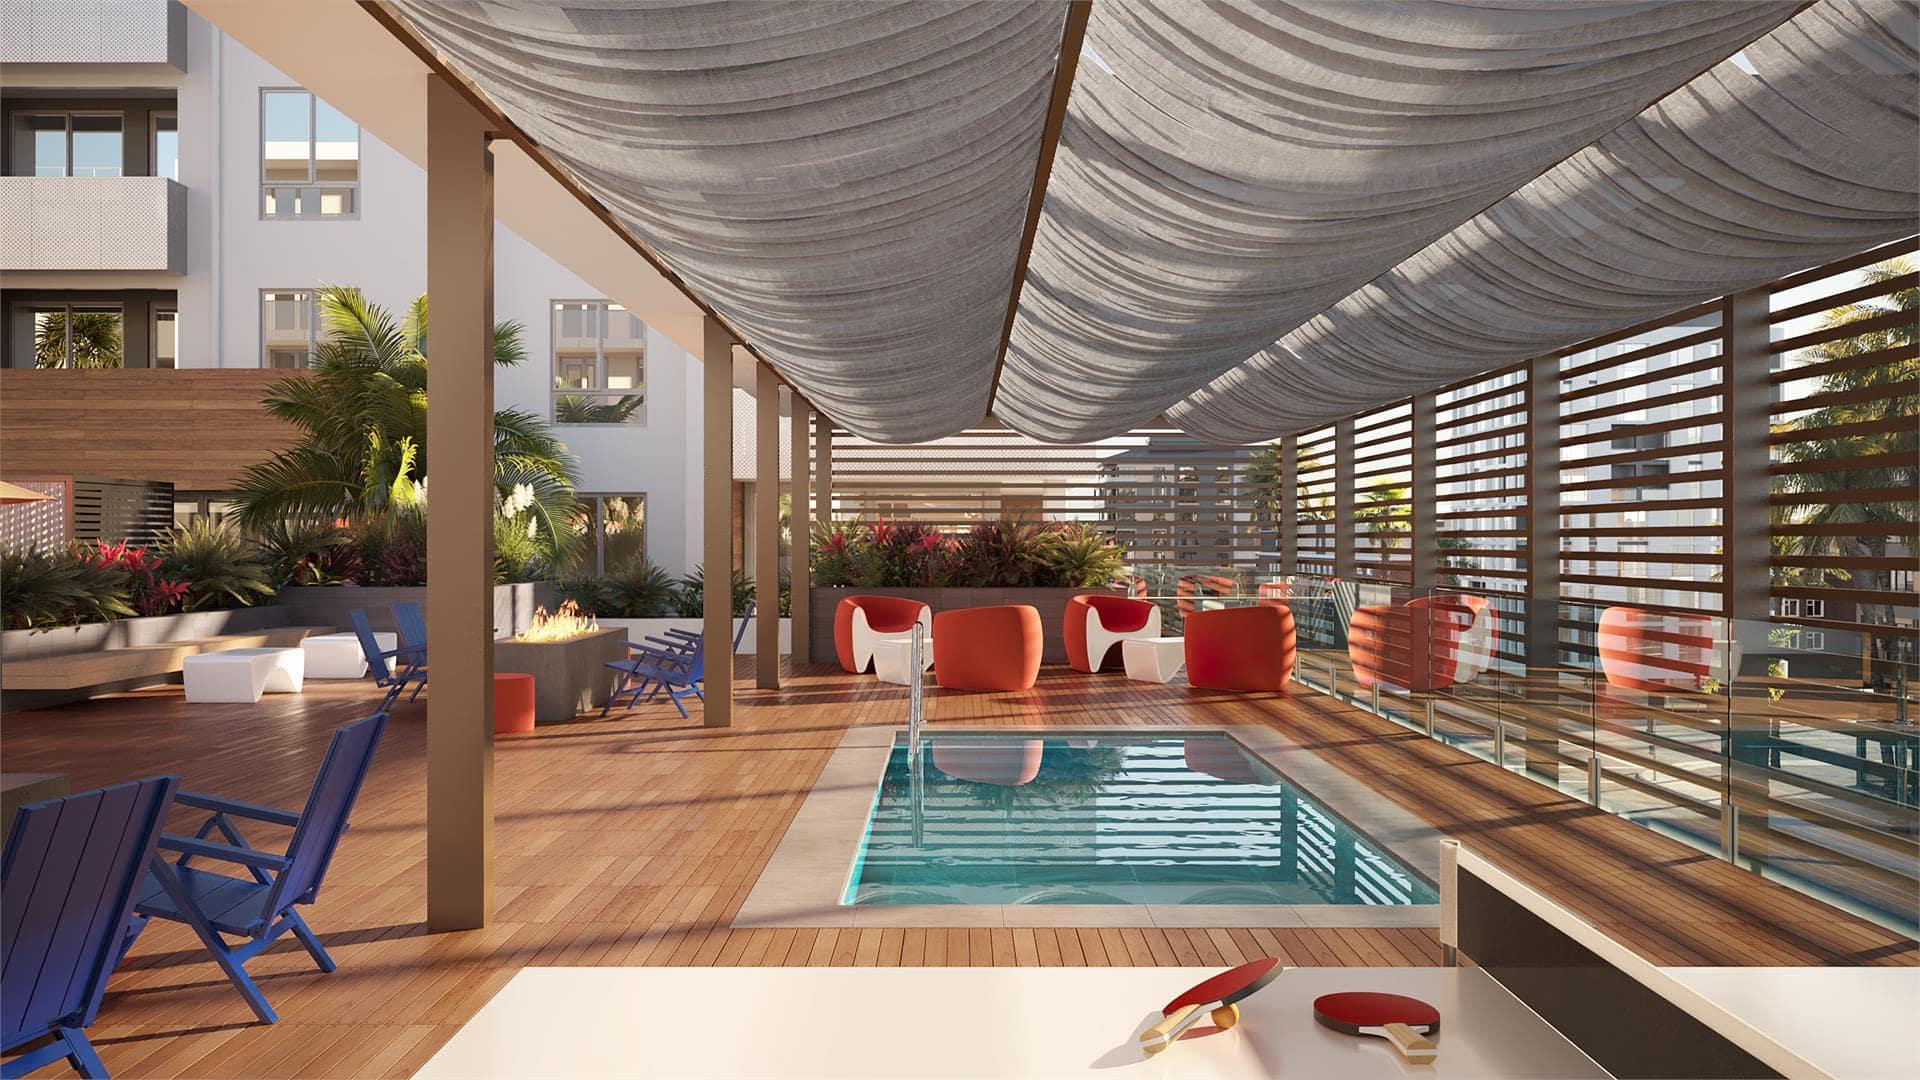 4 New Luxury Apartments In The Valley S Warner Center Neighborhood